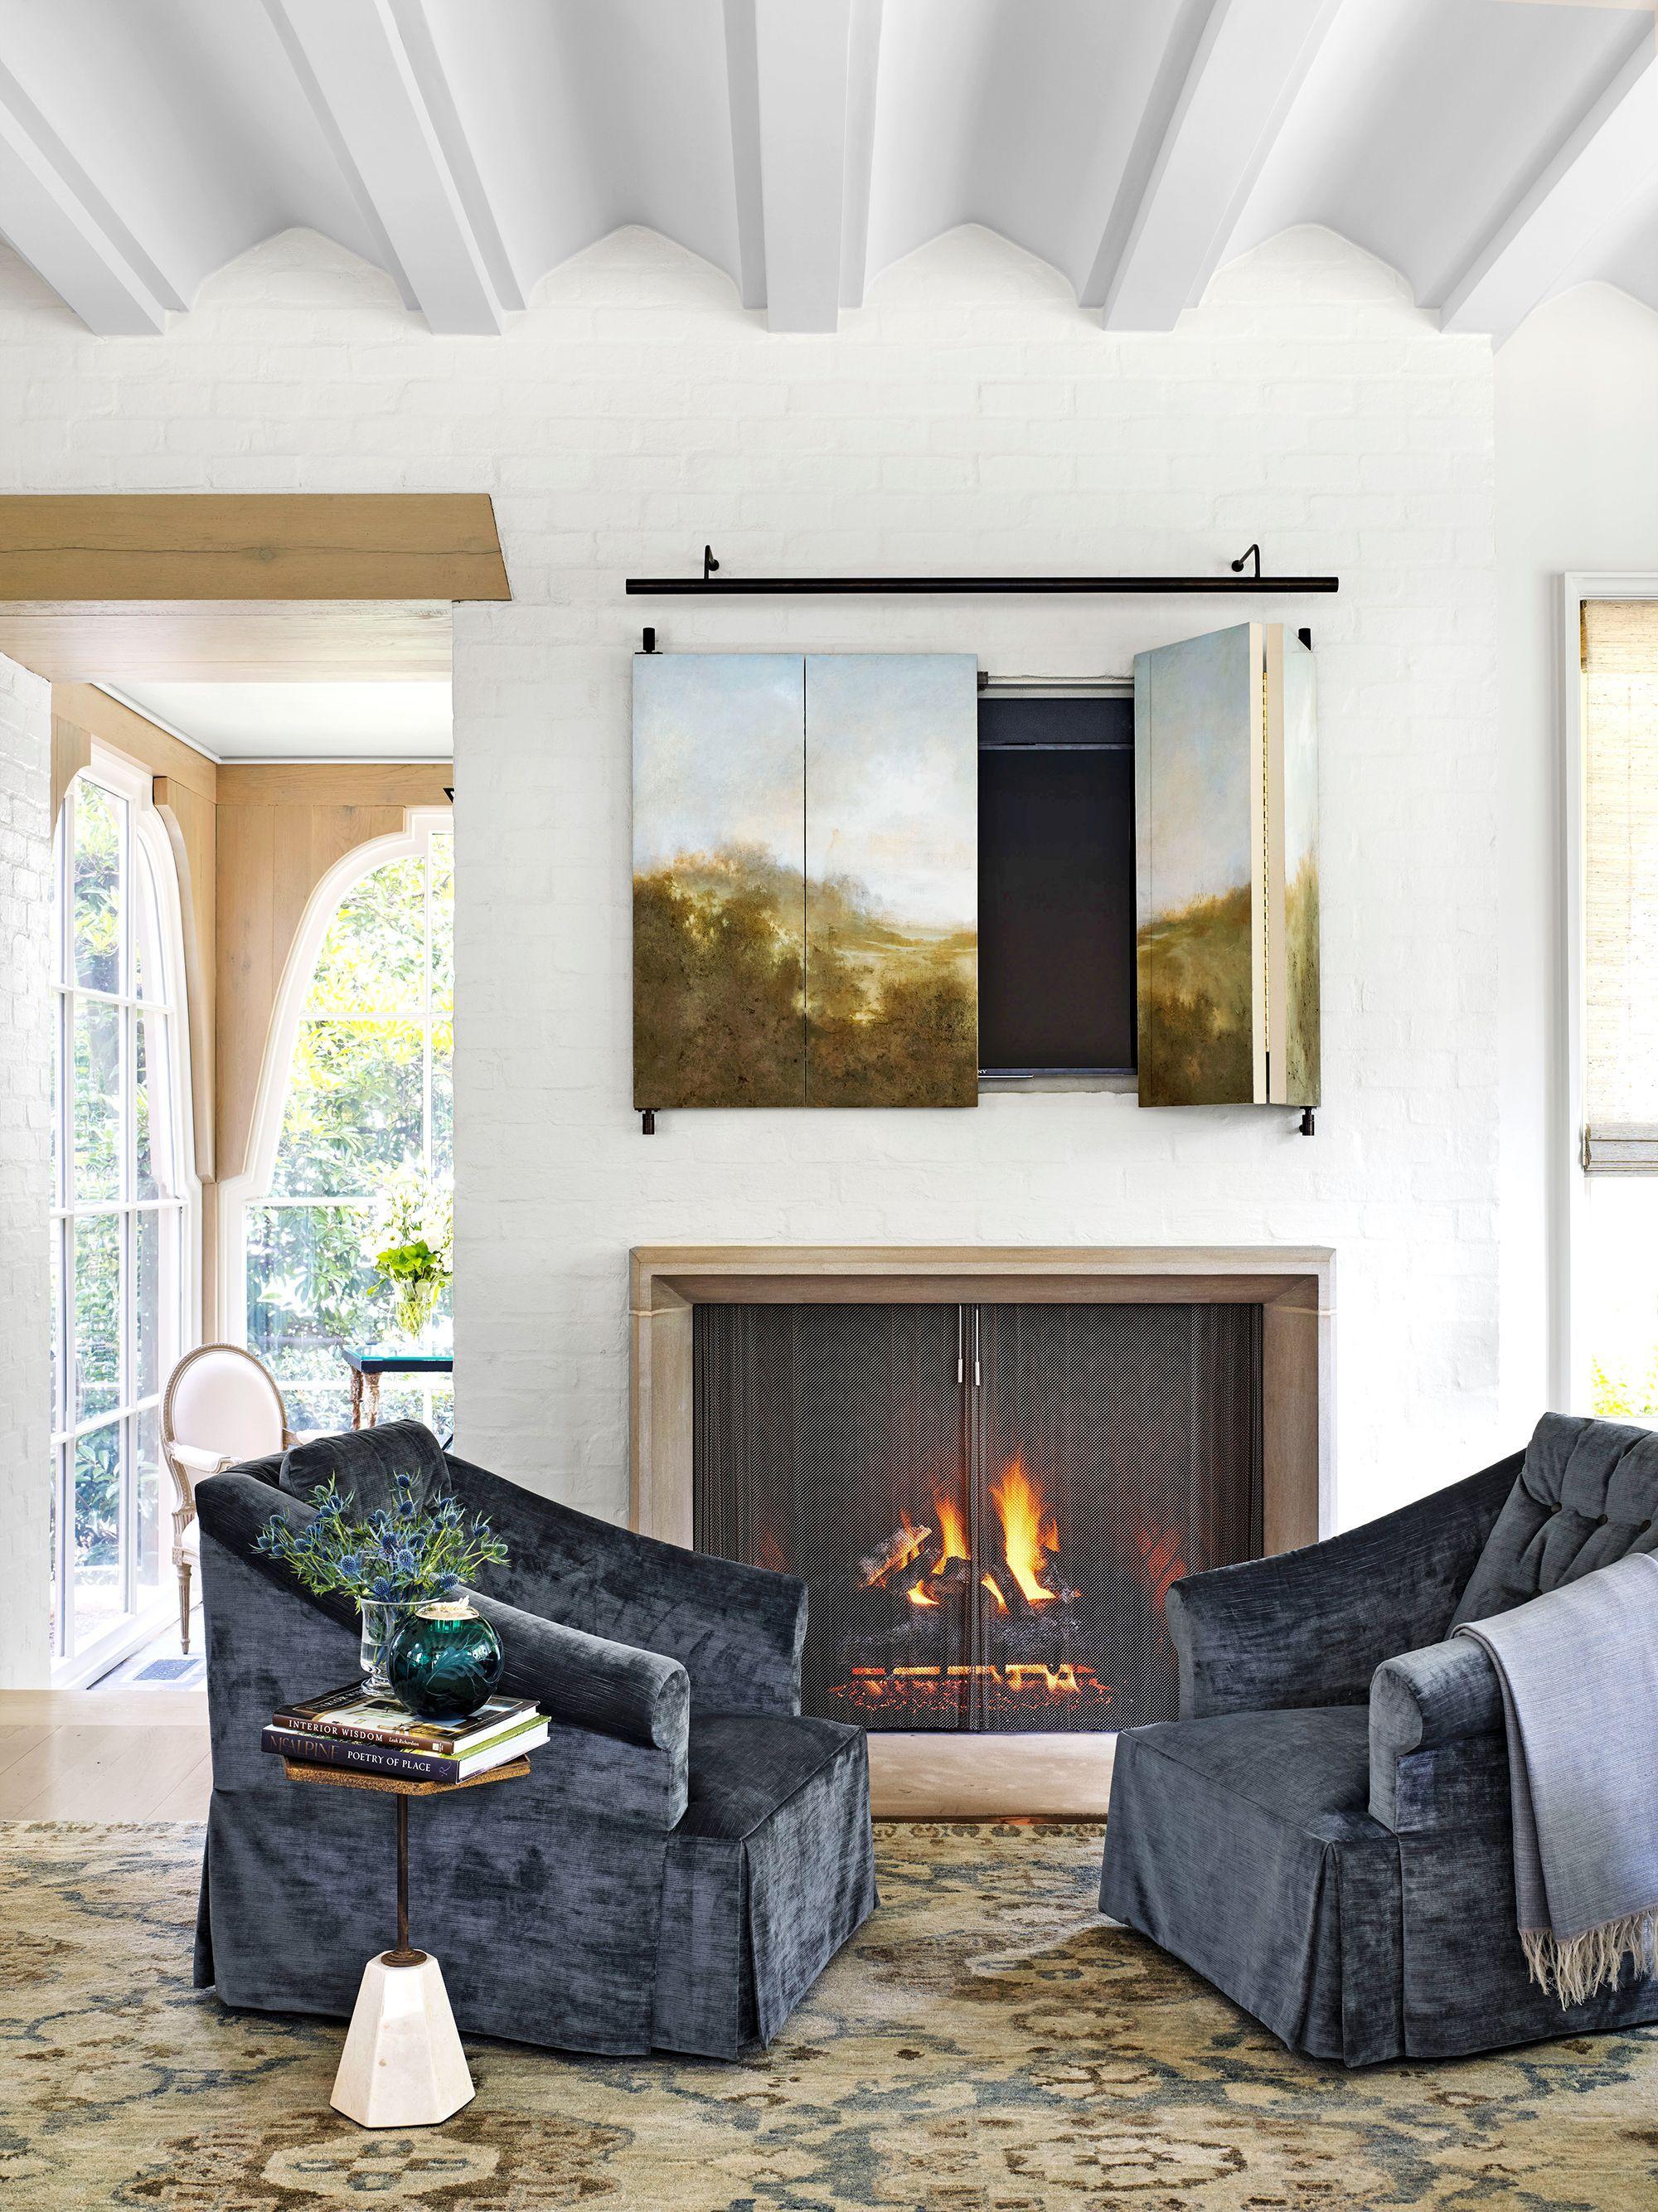 10 Adorable Fireplace Living Room Ceplukan In 2020 S